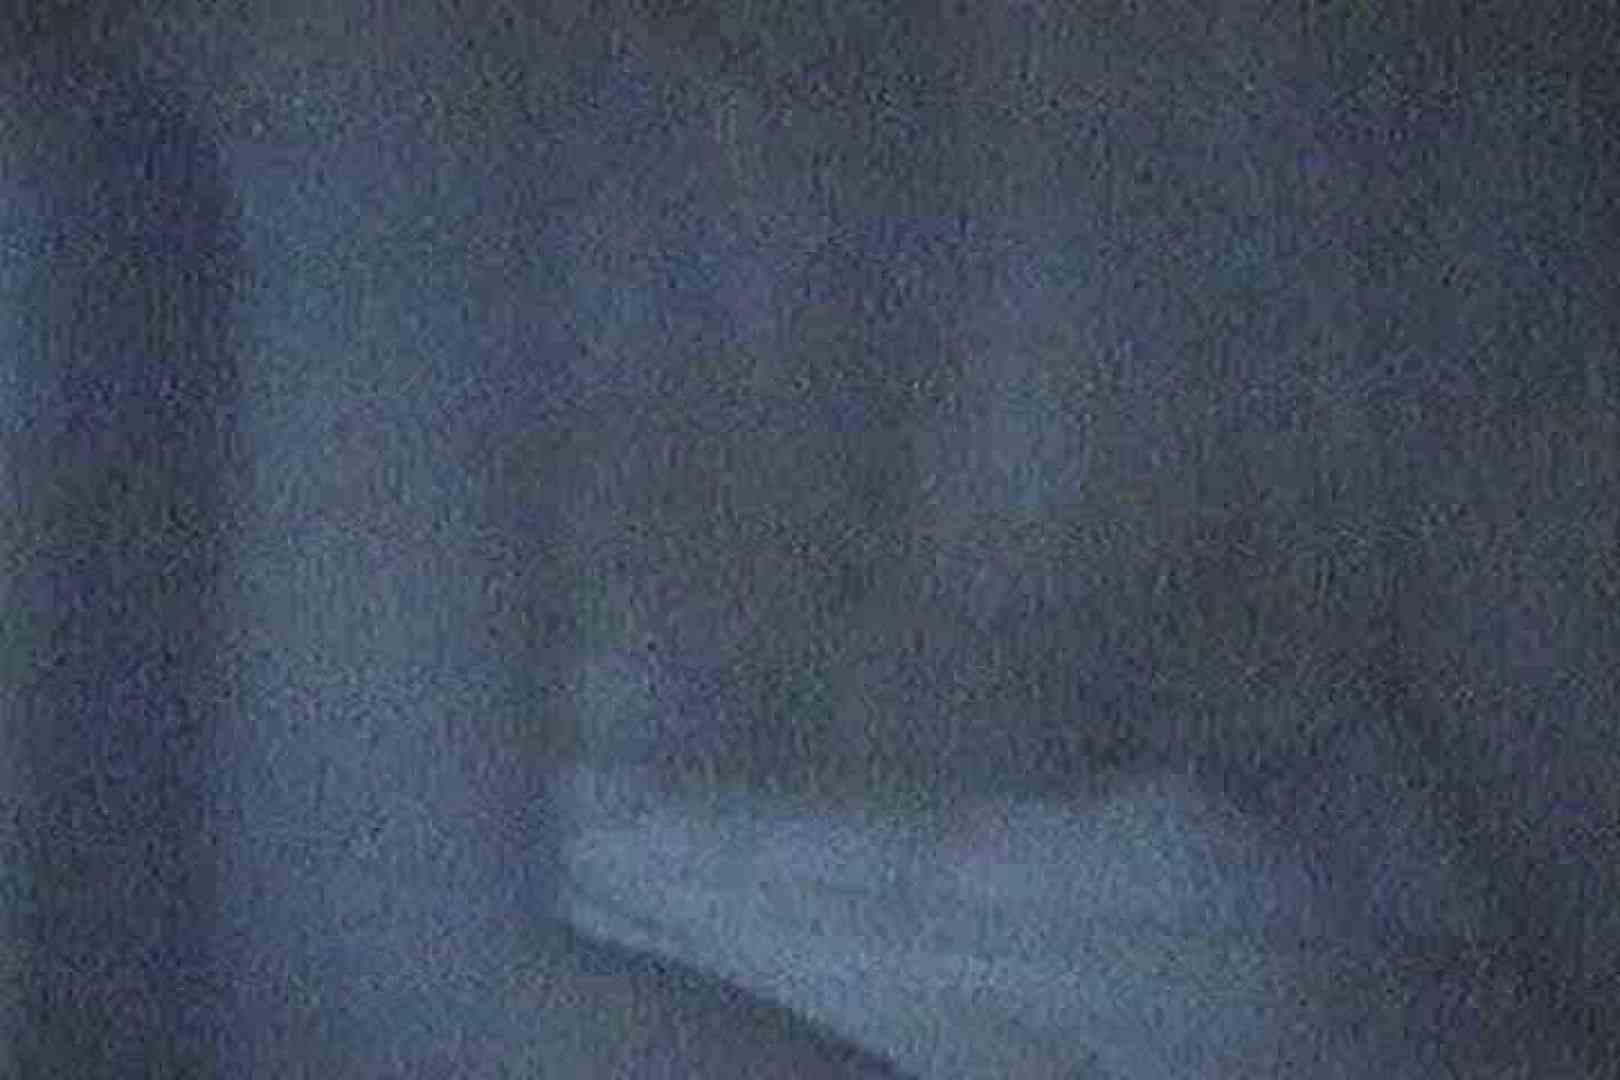 充血監督の深夜の運動会Vol.161 美女OL  106連発 6